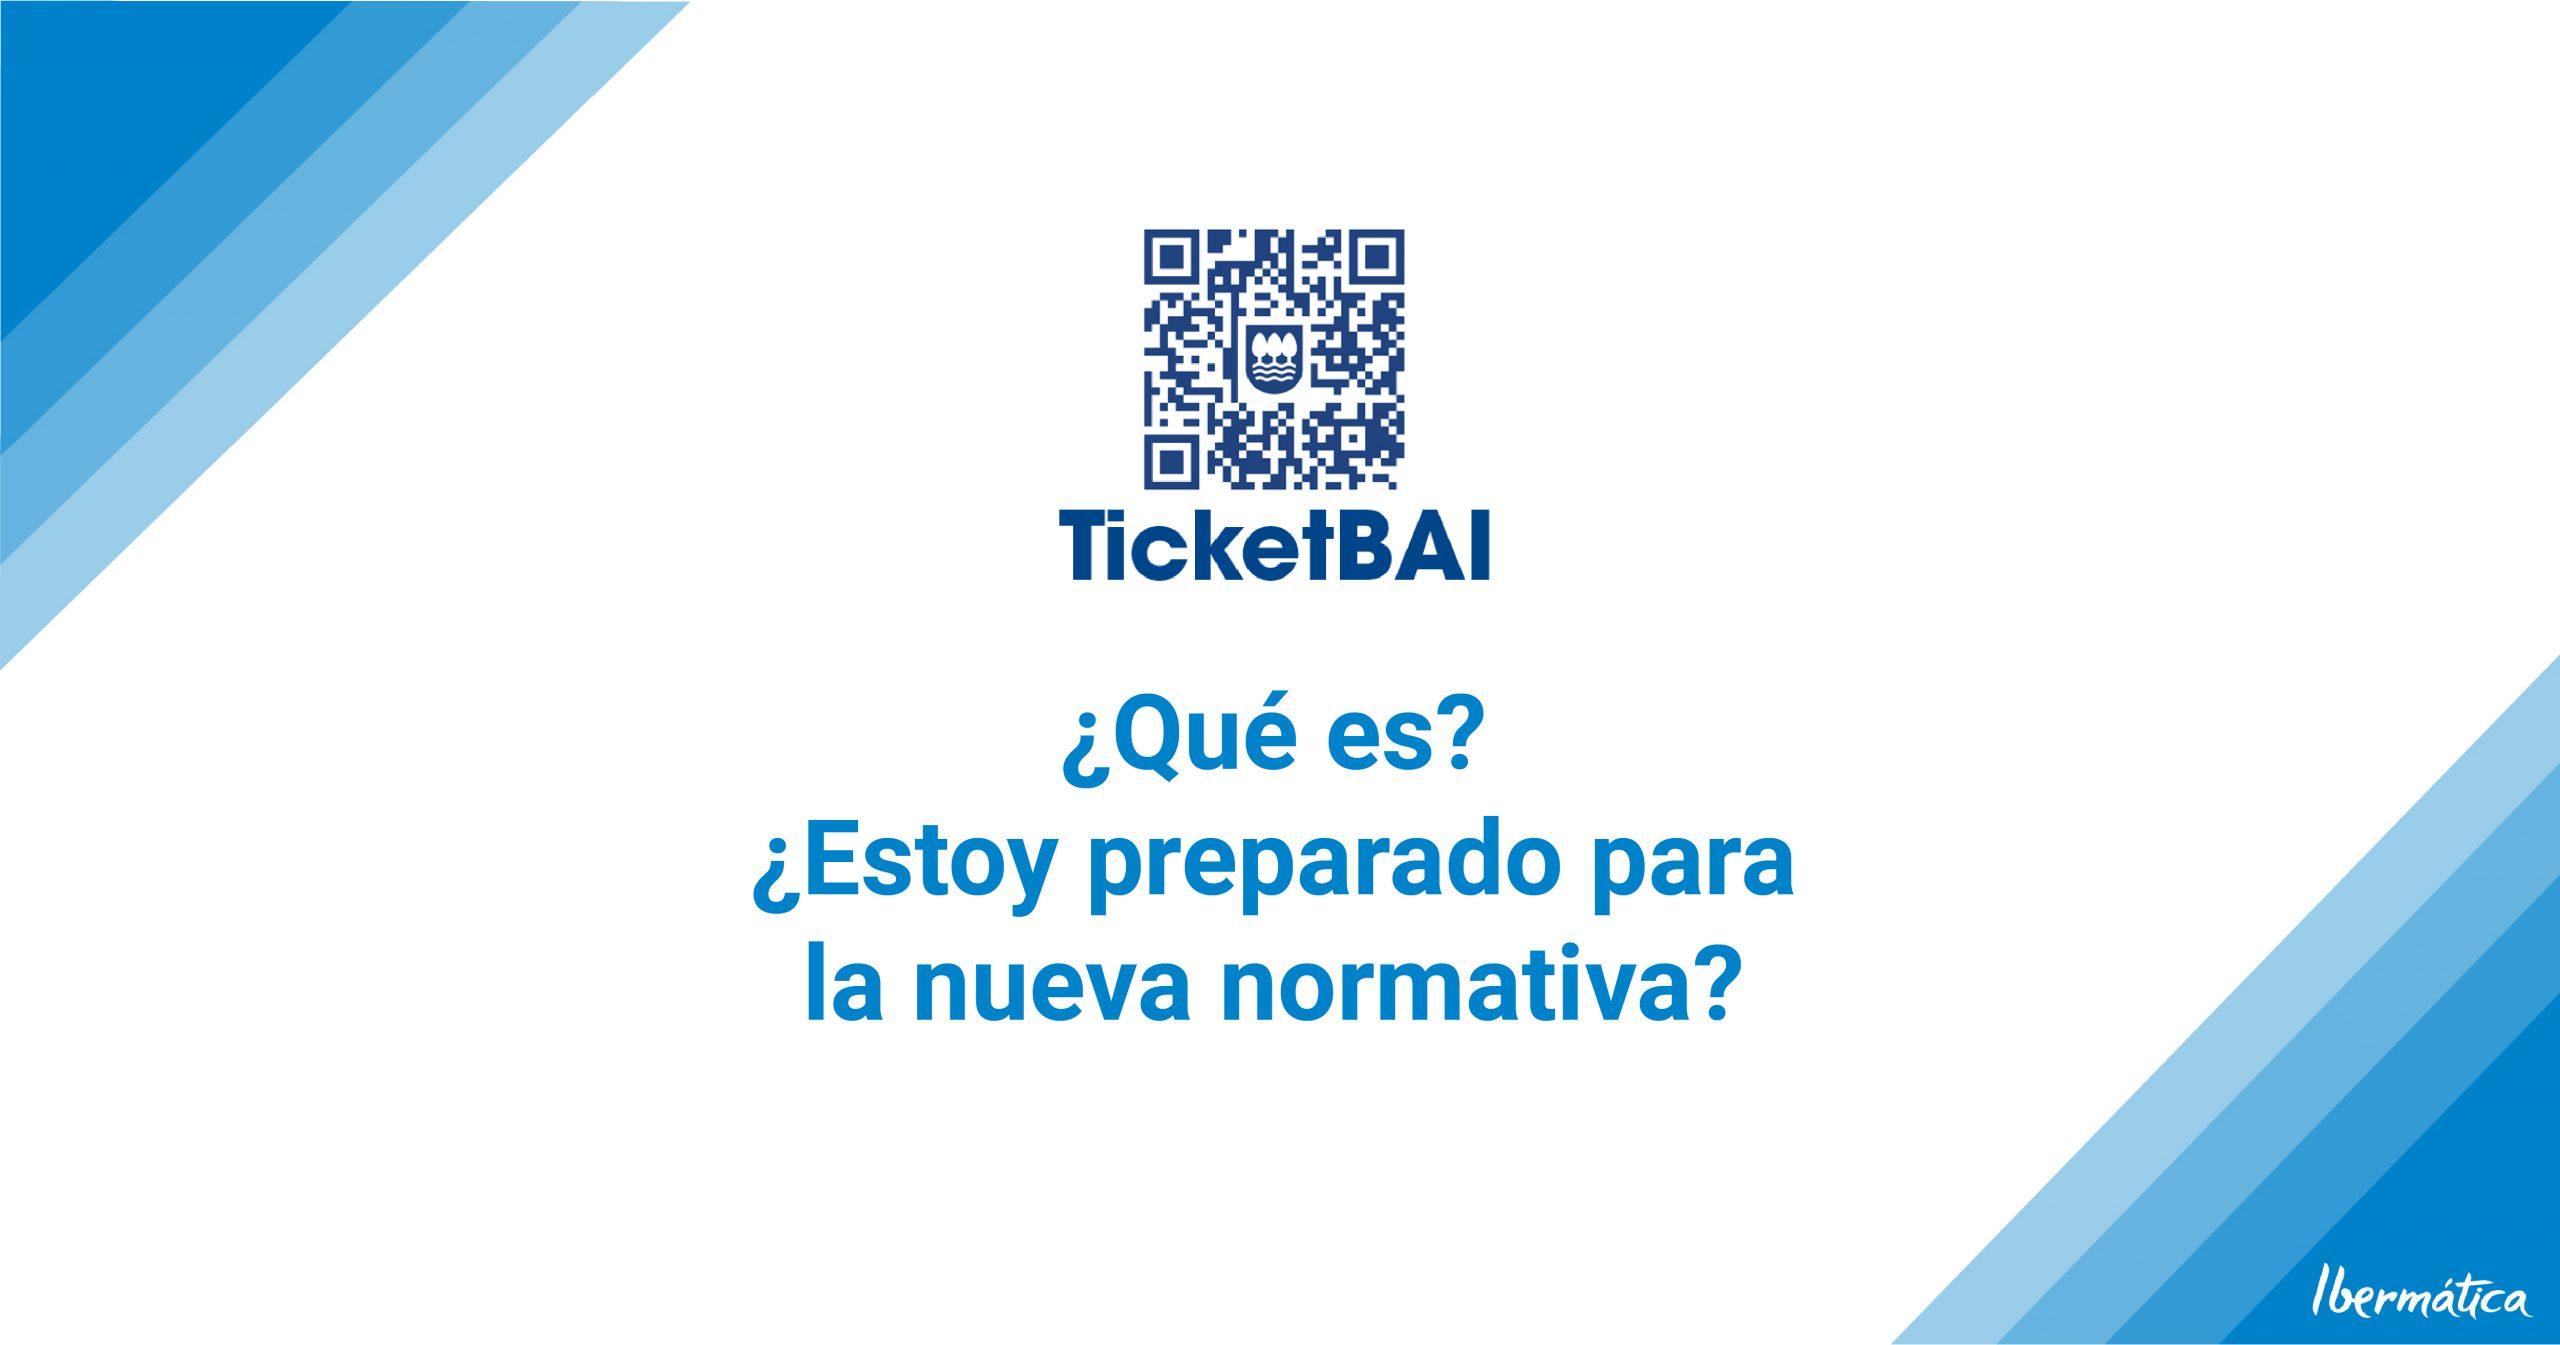 ticket bai